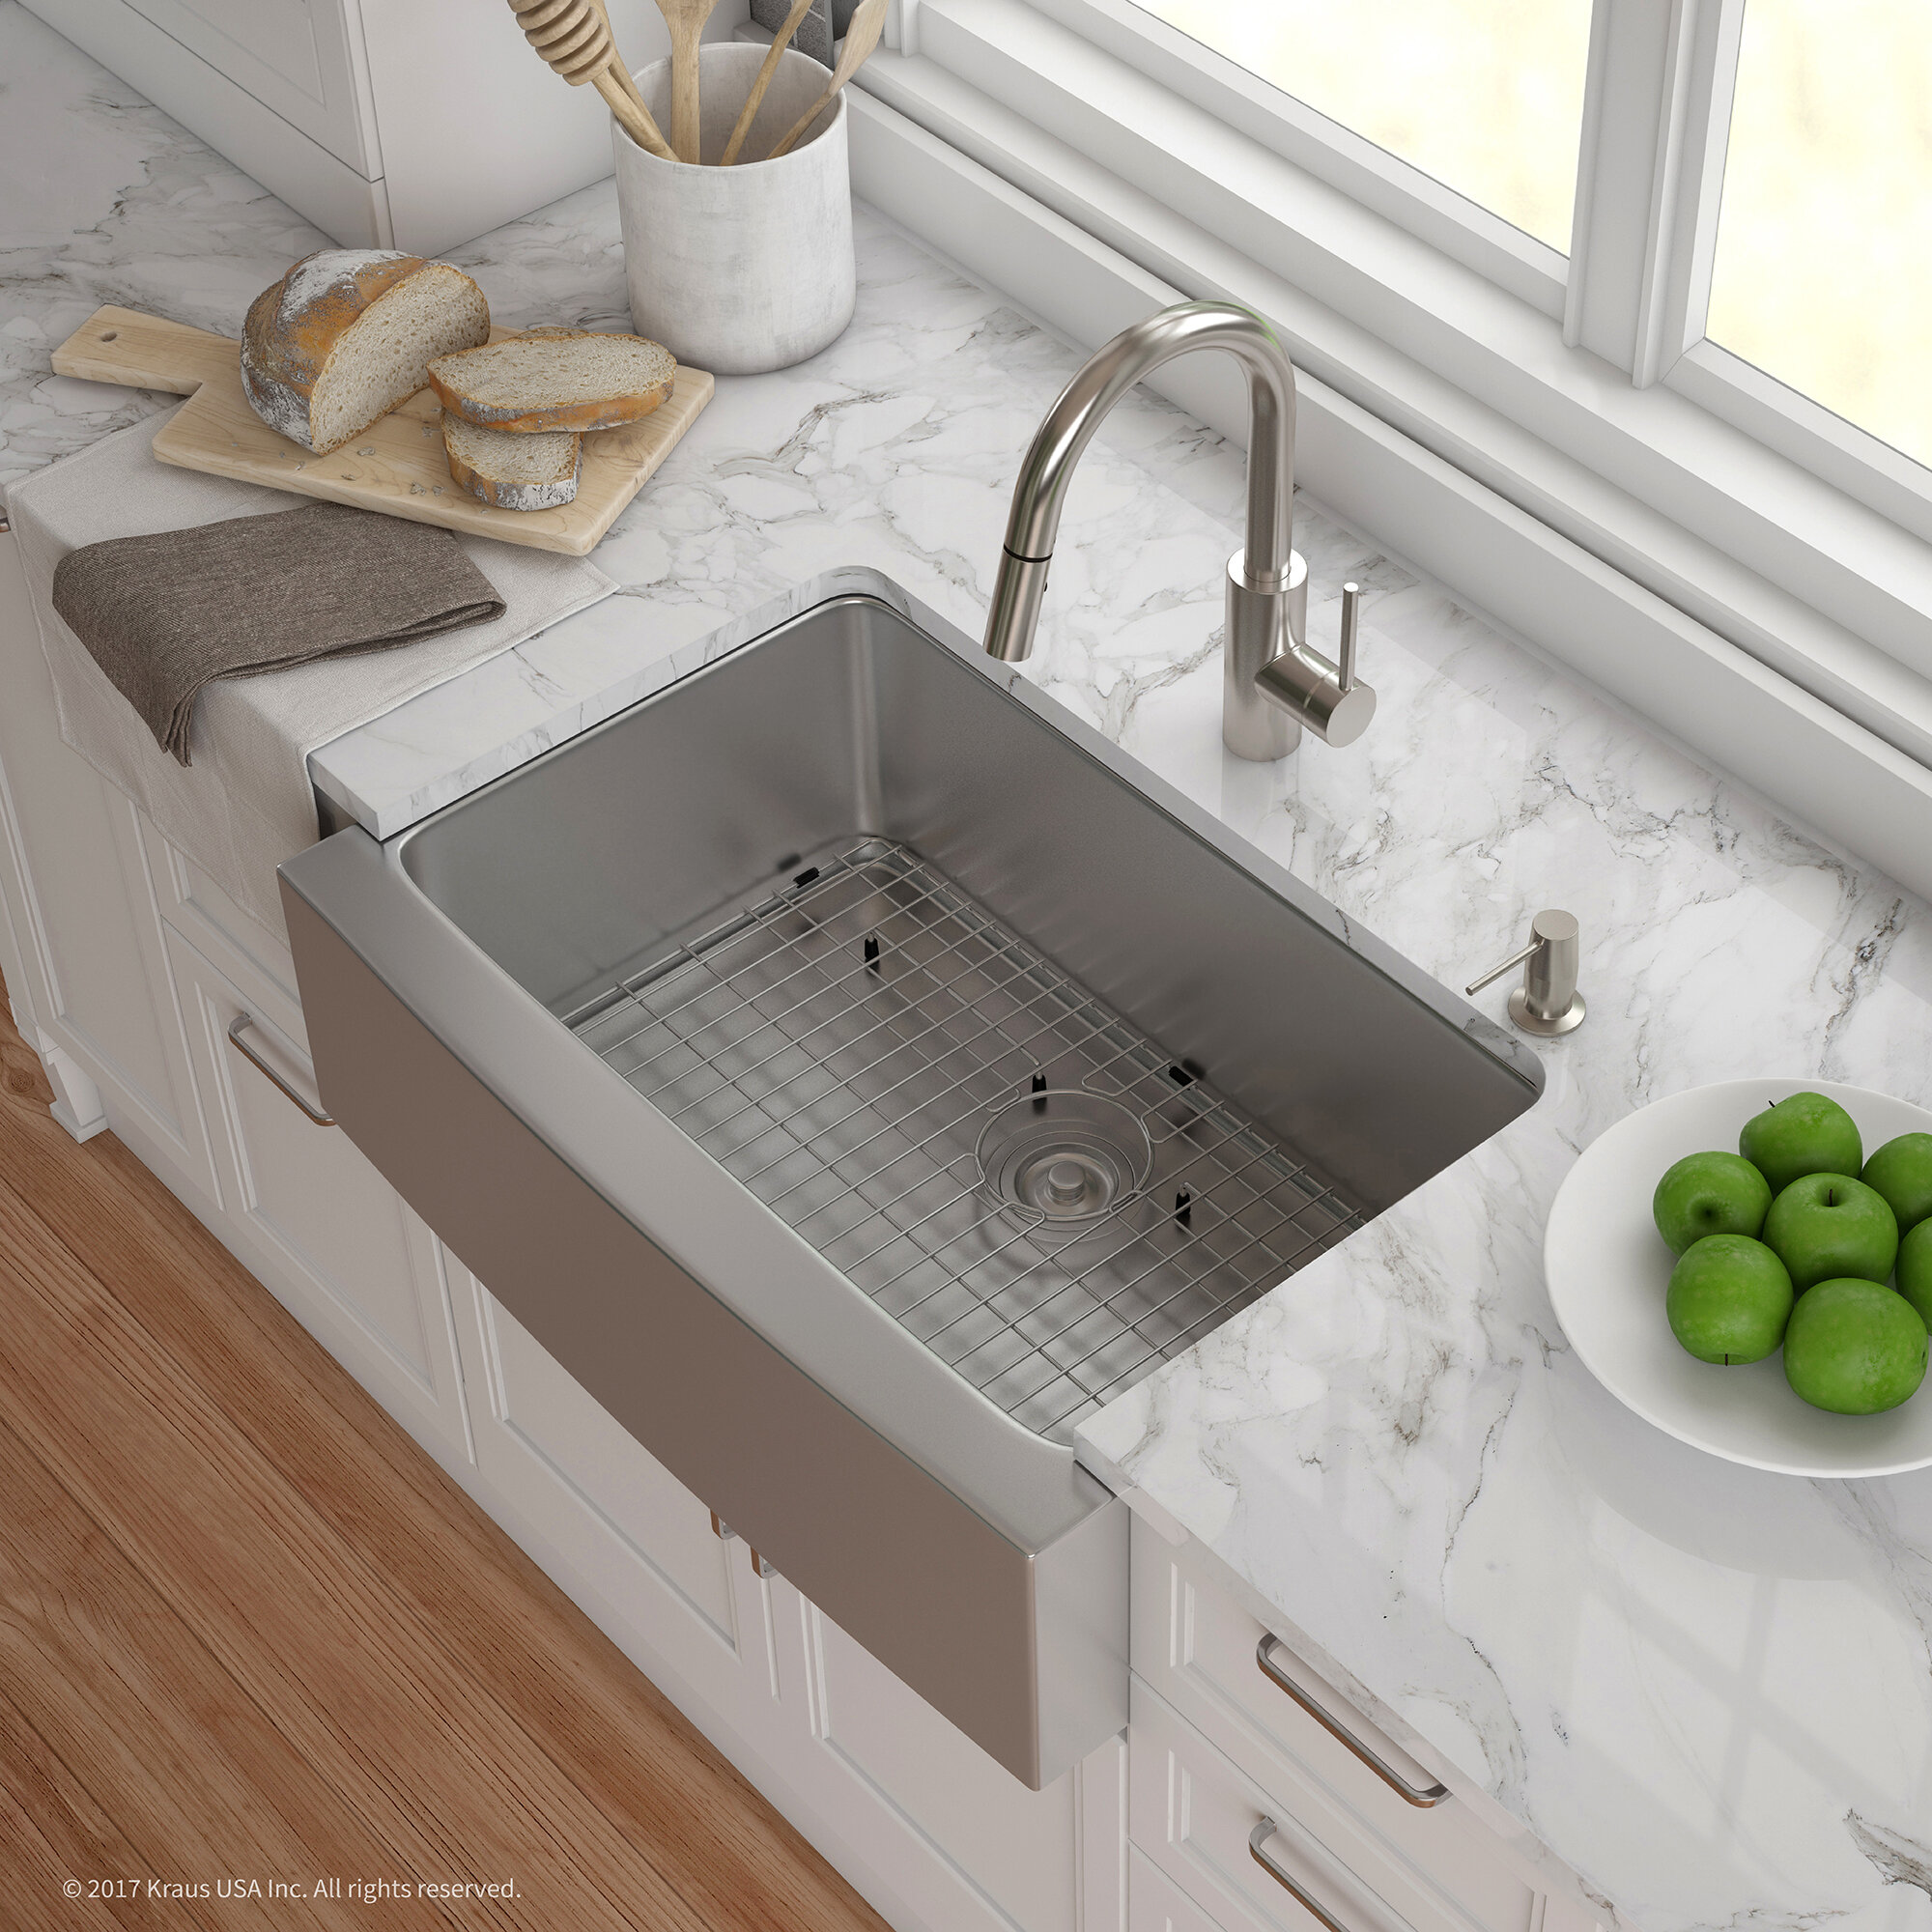 Khf200 30 2620 41ss Kraus Handmade Series 29 75 L X 20 75 W Farmhouse Kitchen Sink With Faucet And Soap Dispenser Wayfair